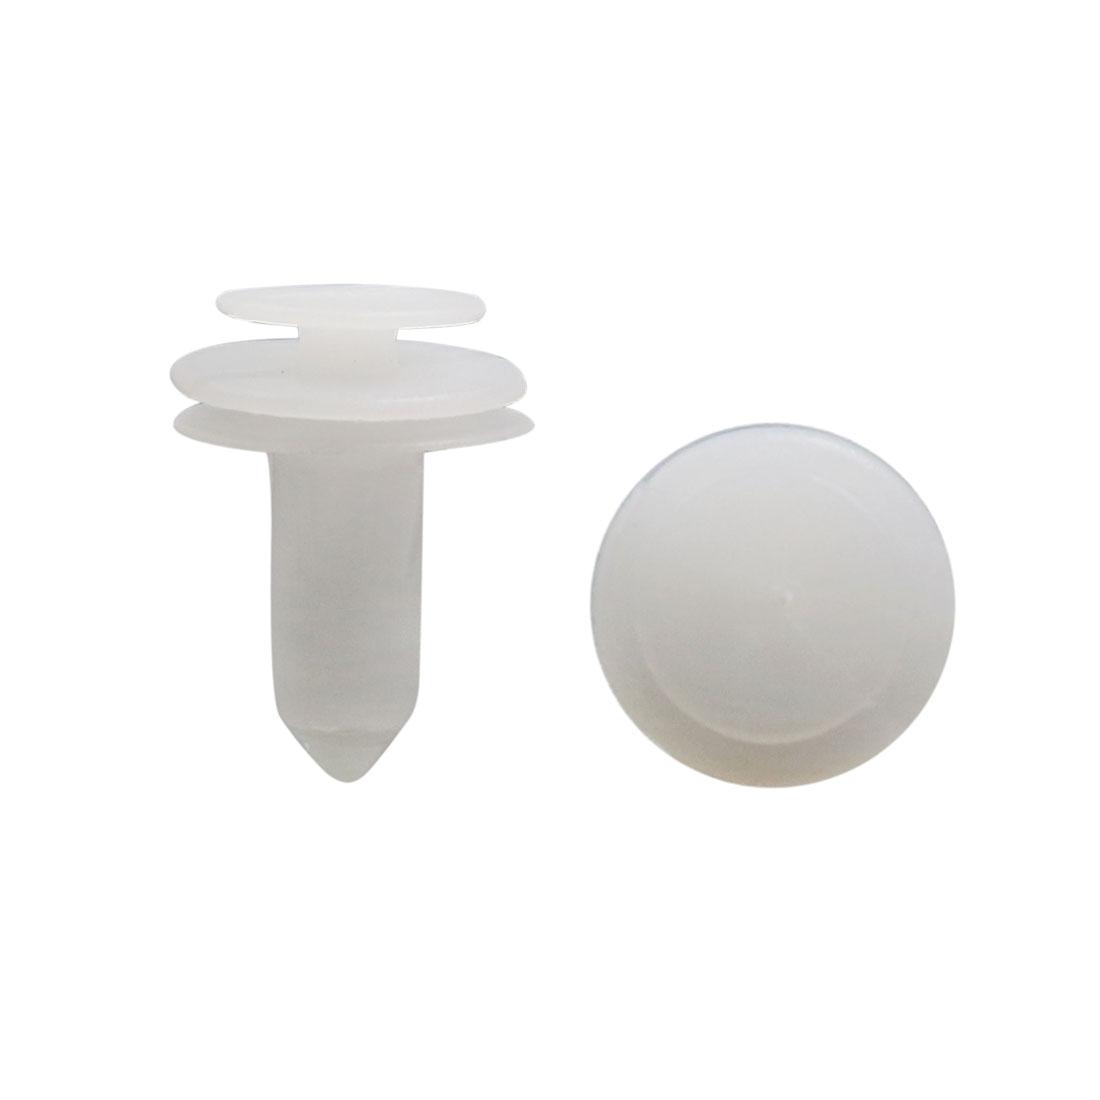 100Pcs Plastic Rivets Push Pin Type Bumper Fender Fastener Retainer White 9mm